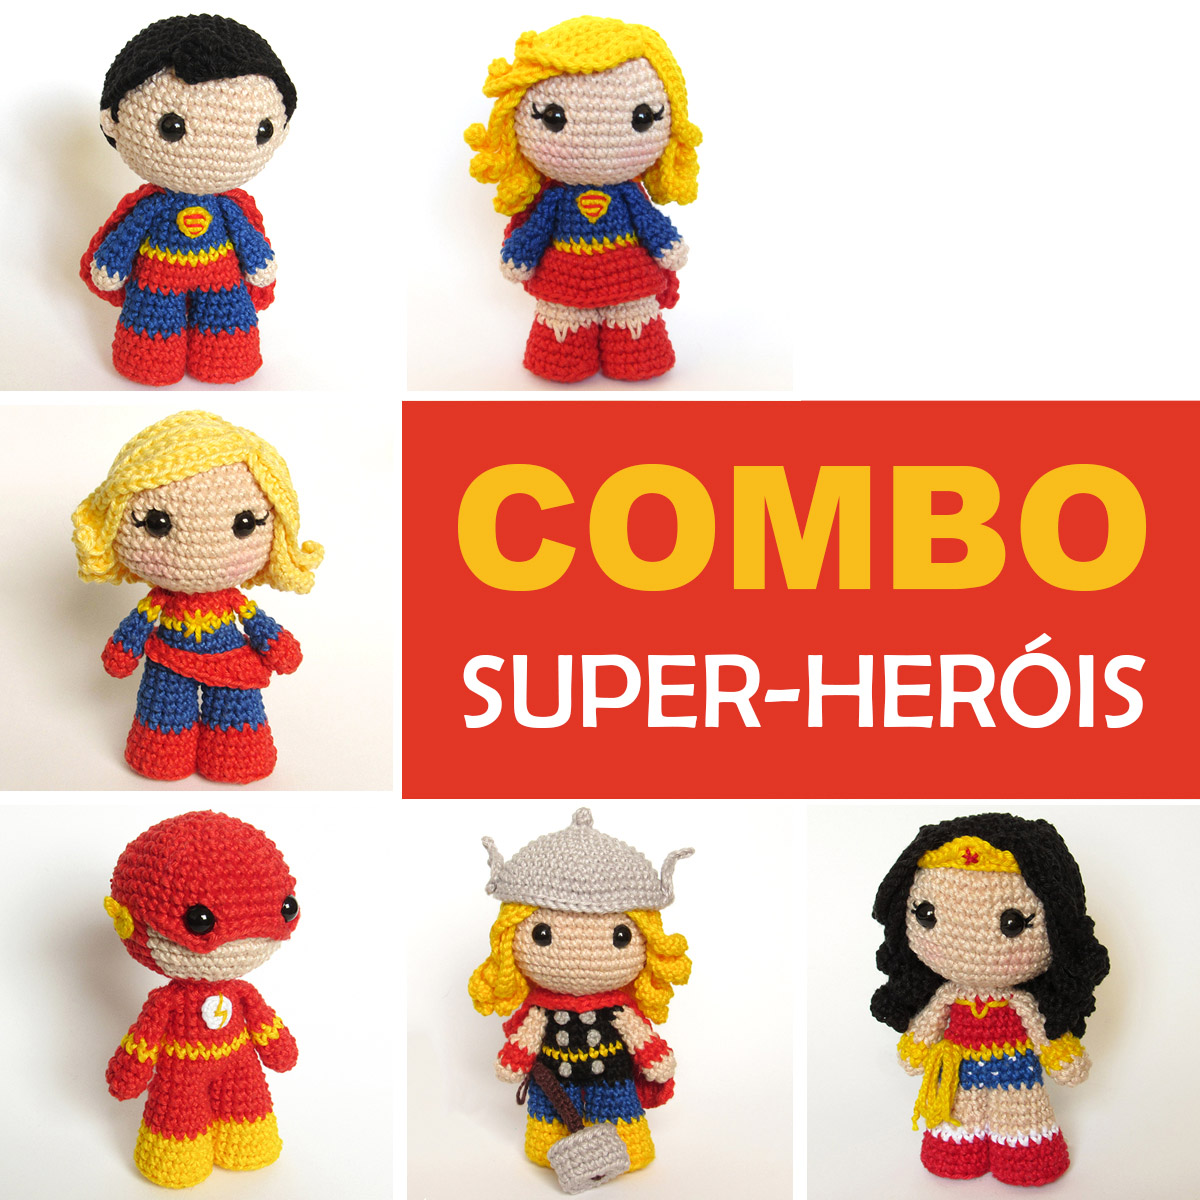 Super Herói Super Homem (superman) Em Crochê - Amigurumi - R$ 239 ... | 1200x1200